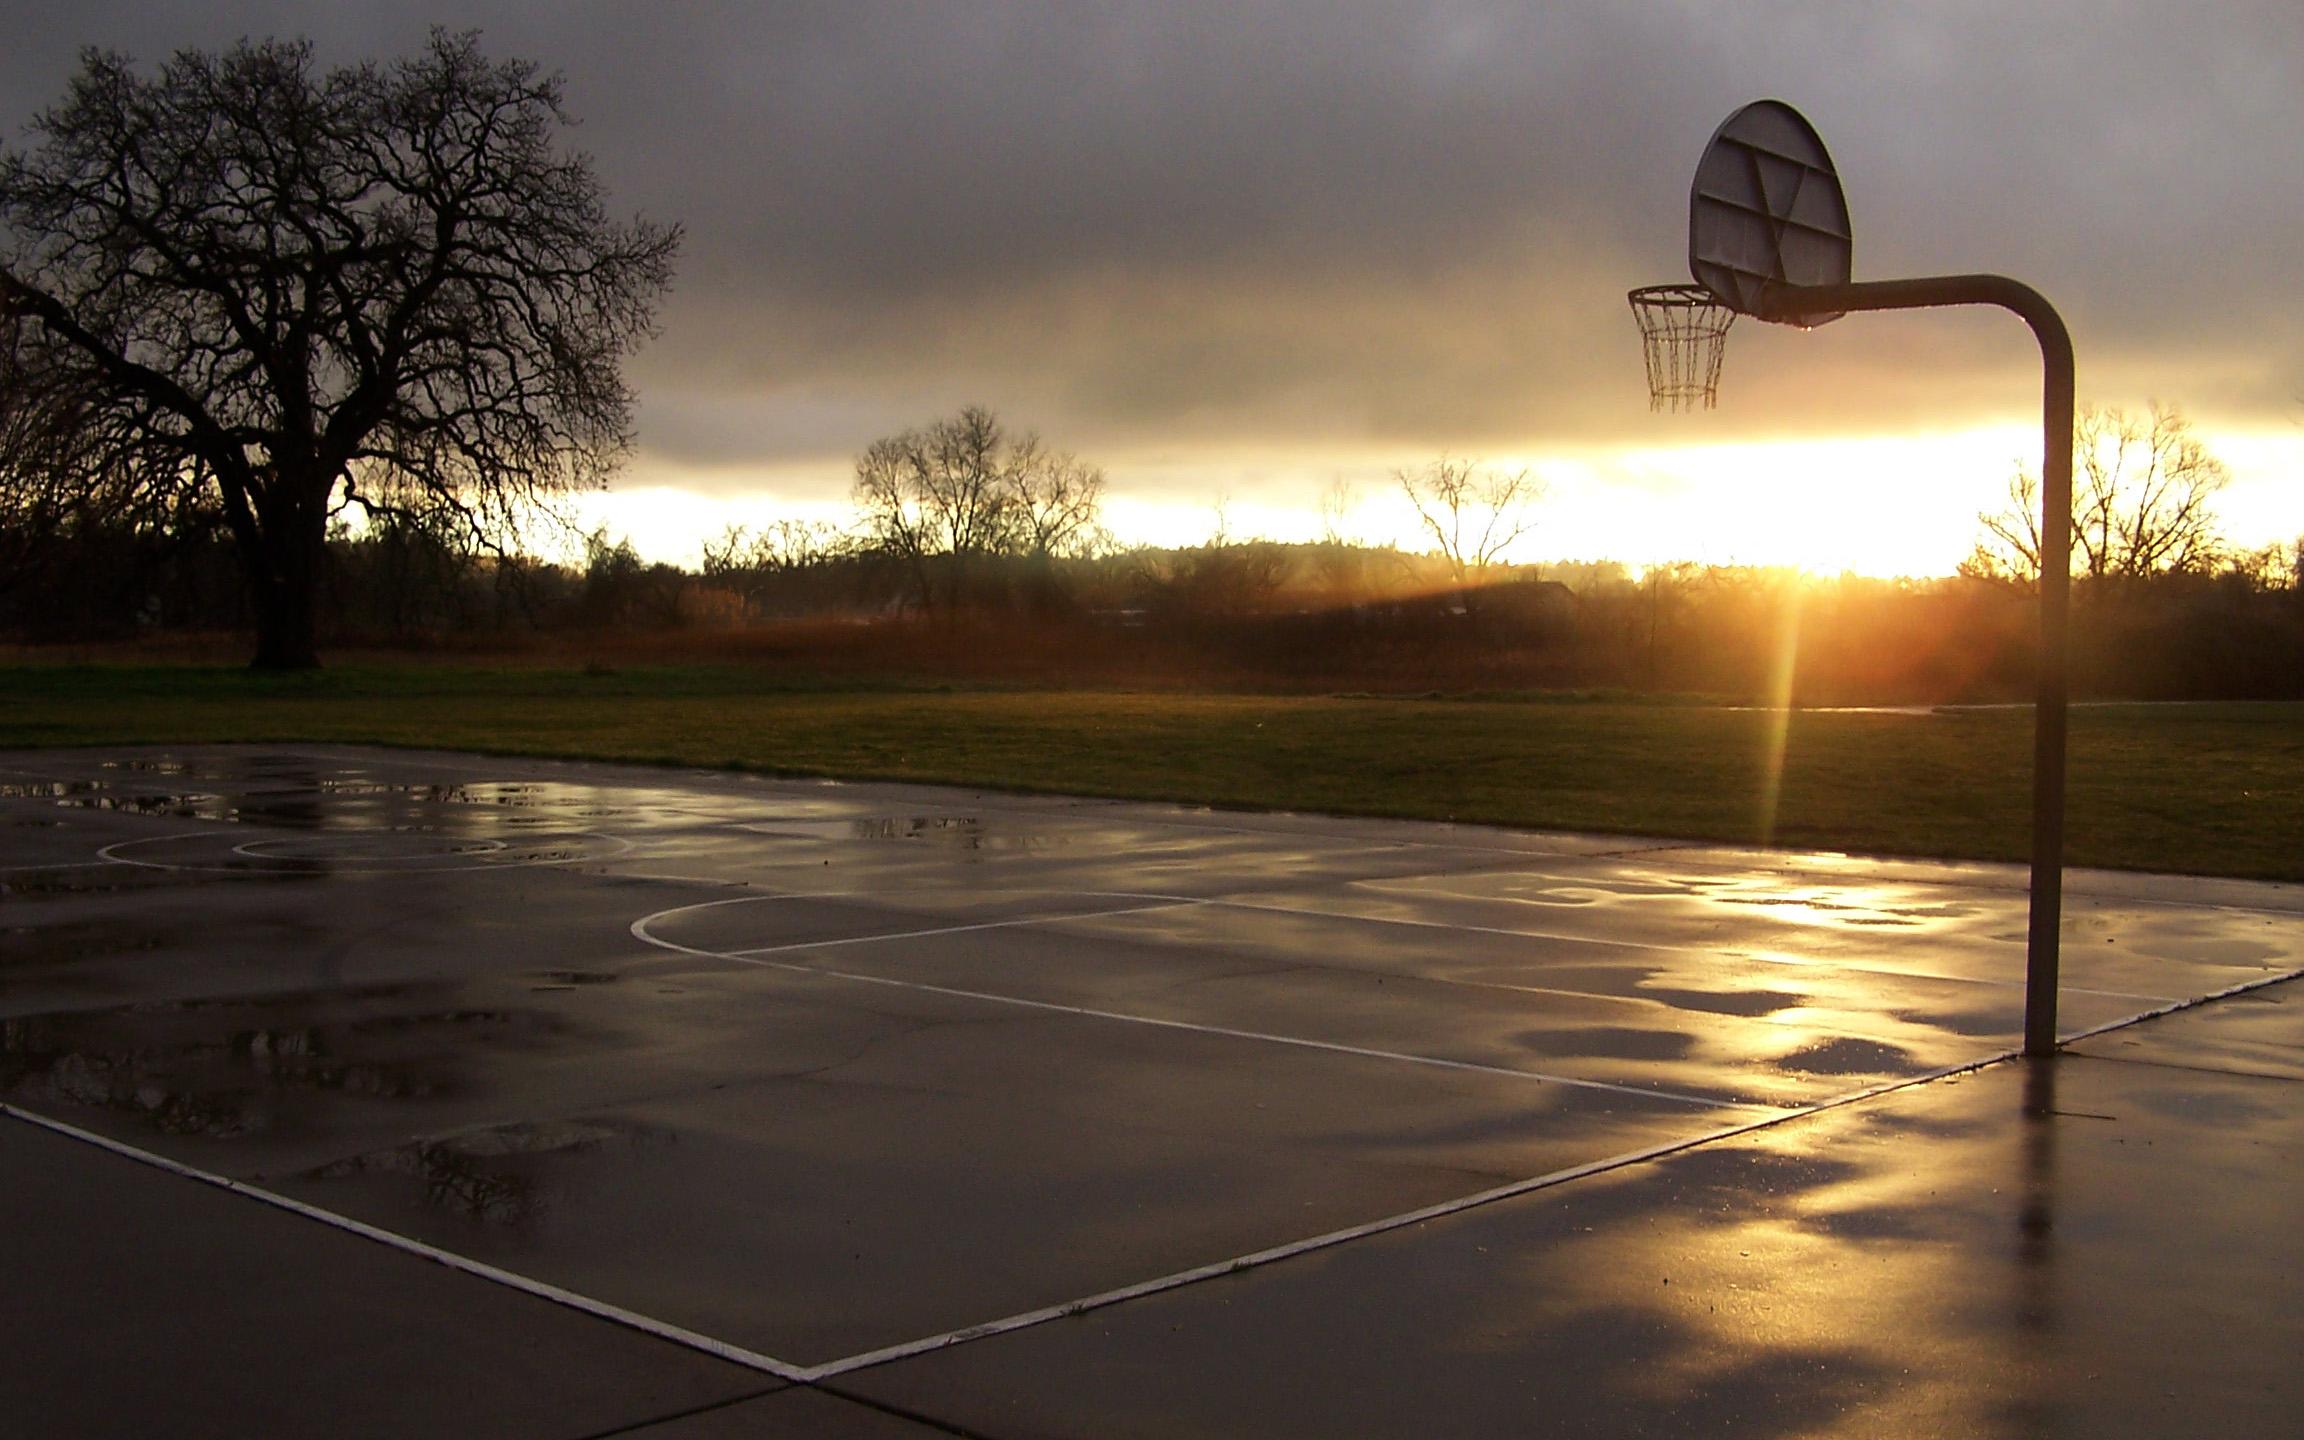 [46+] Basketball Court Wallpaper HD on WallpaperSafari